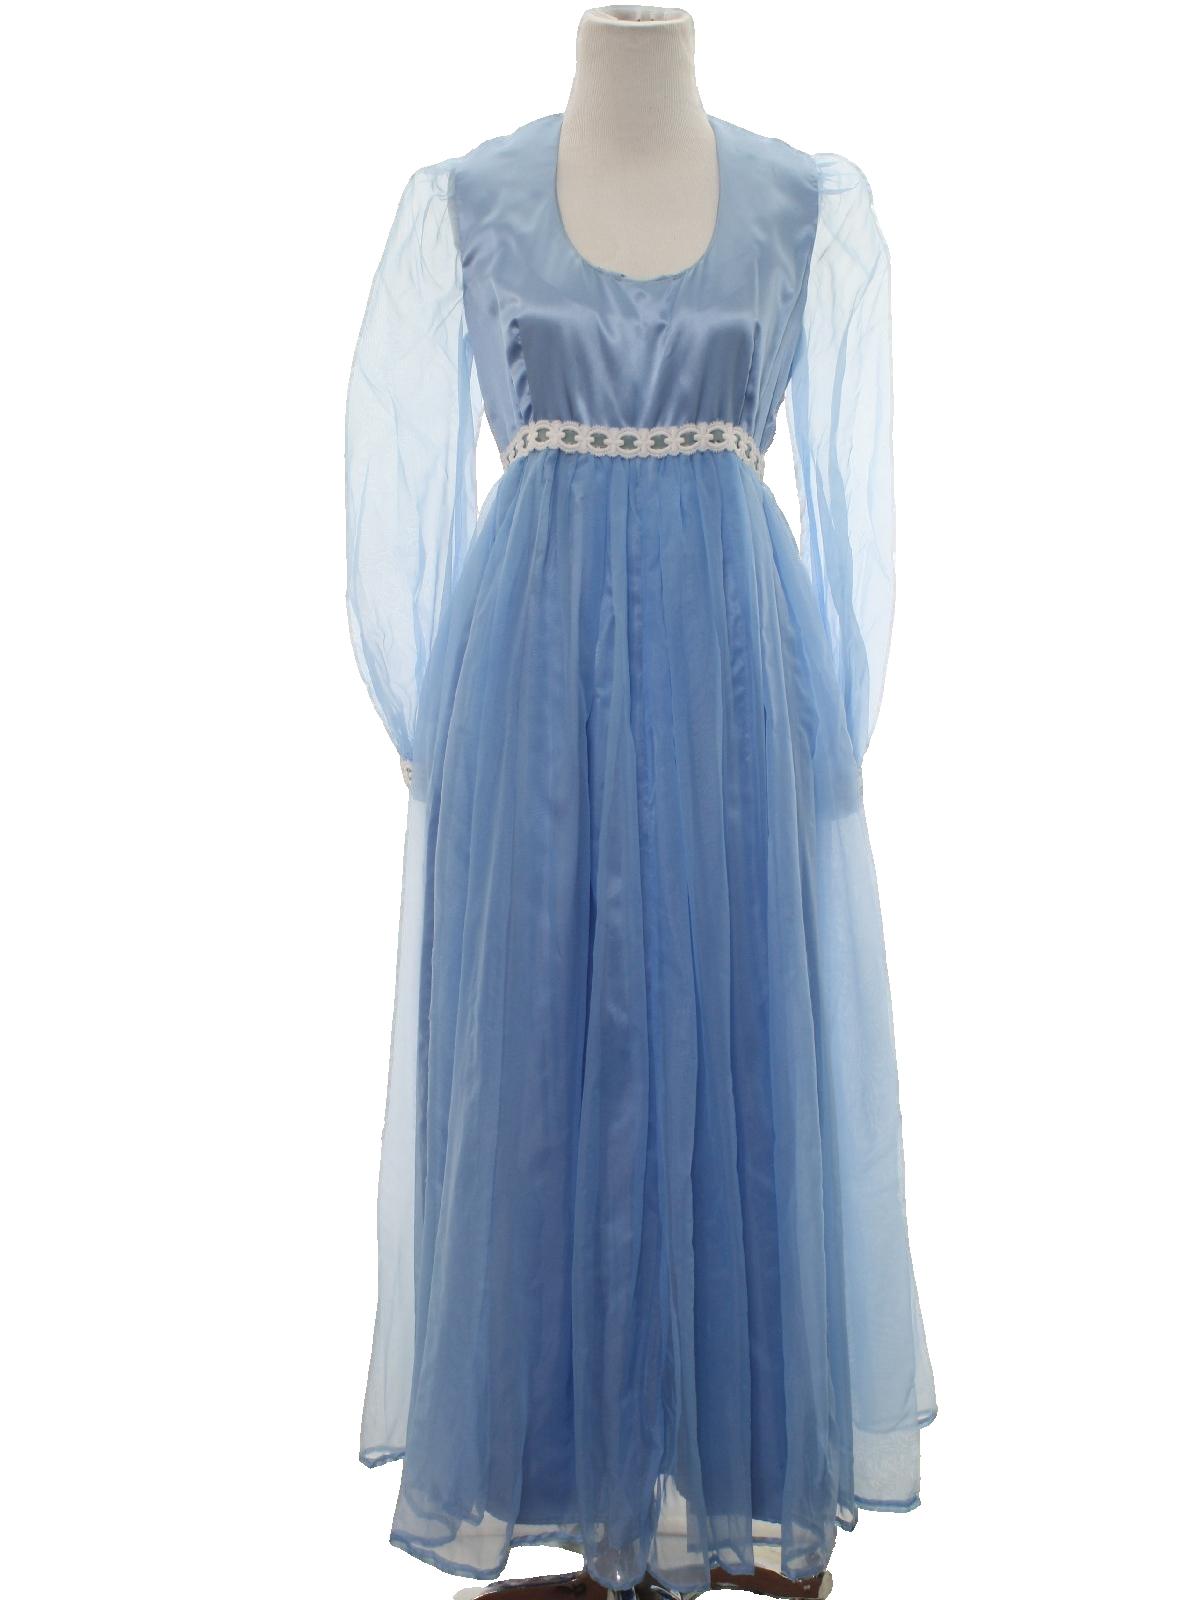 70s -Home Sewn- Womens blue satin